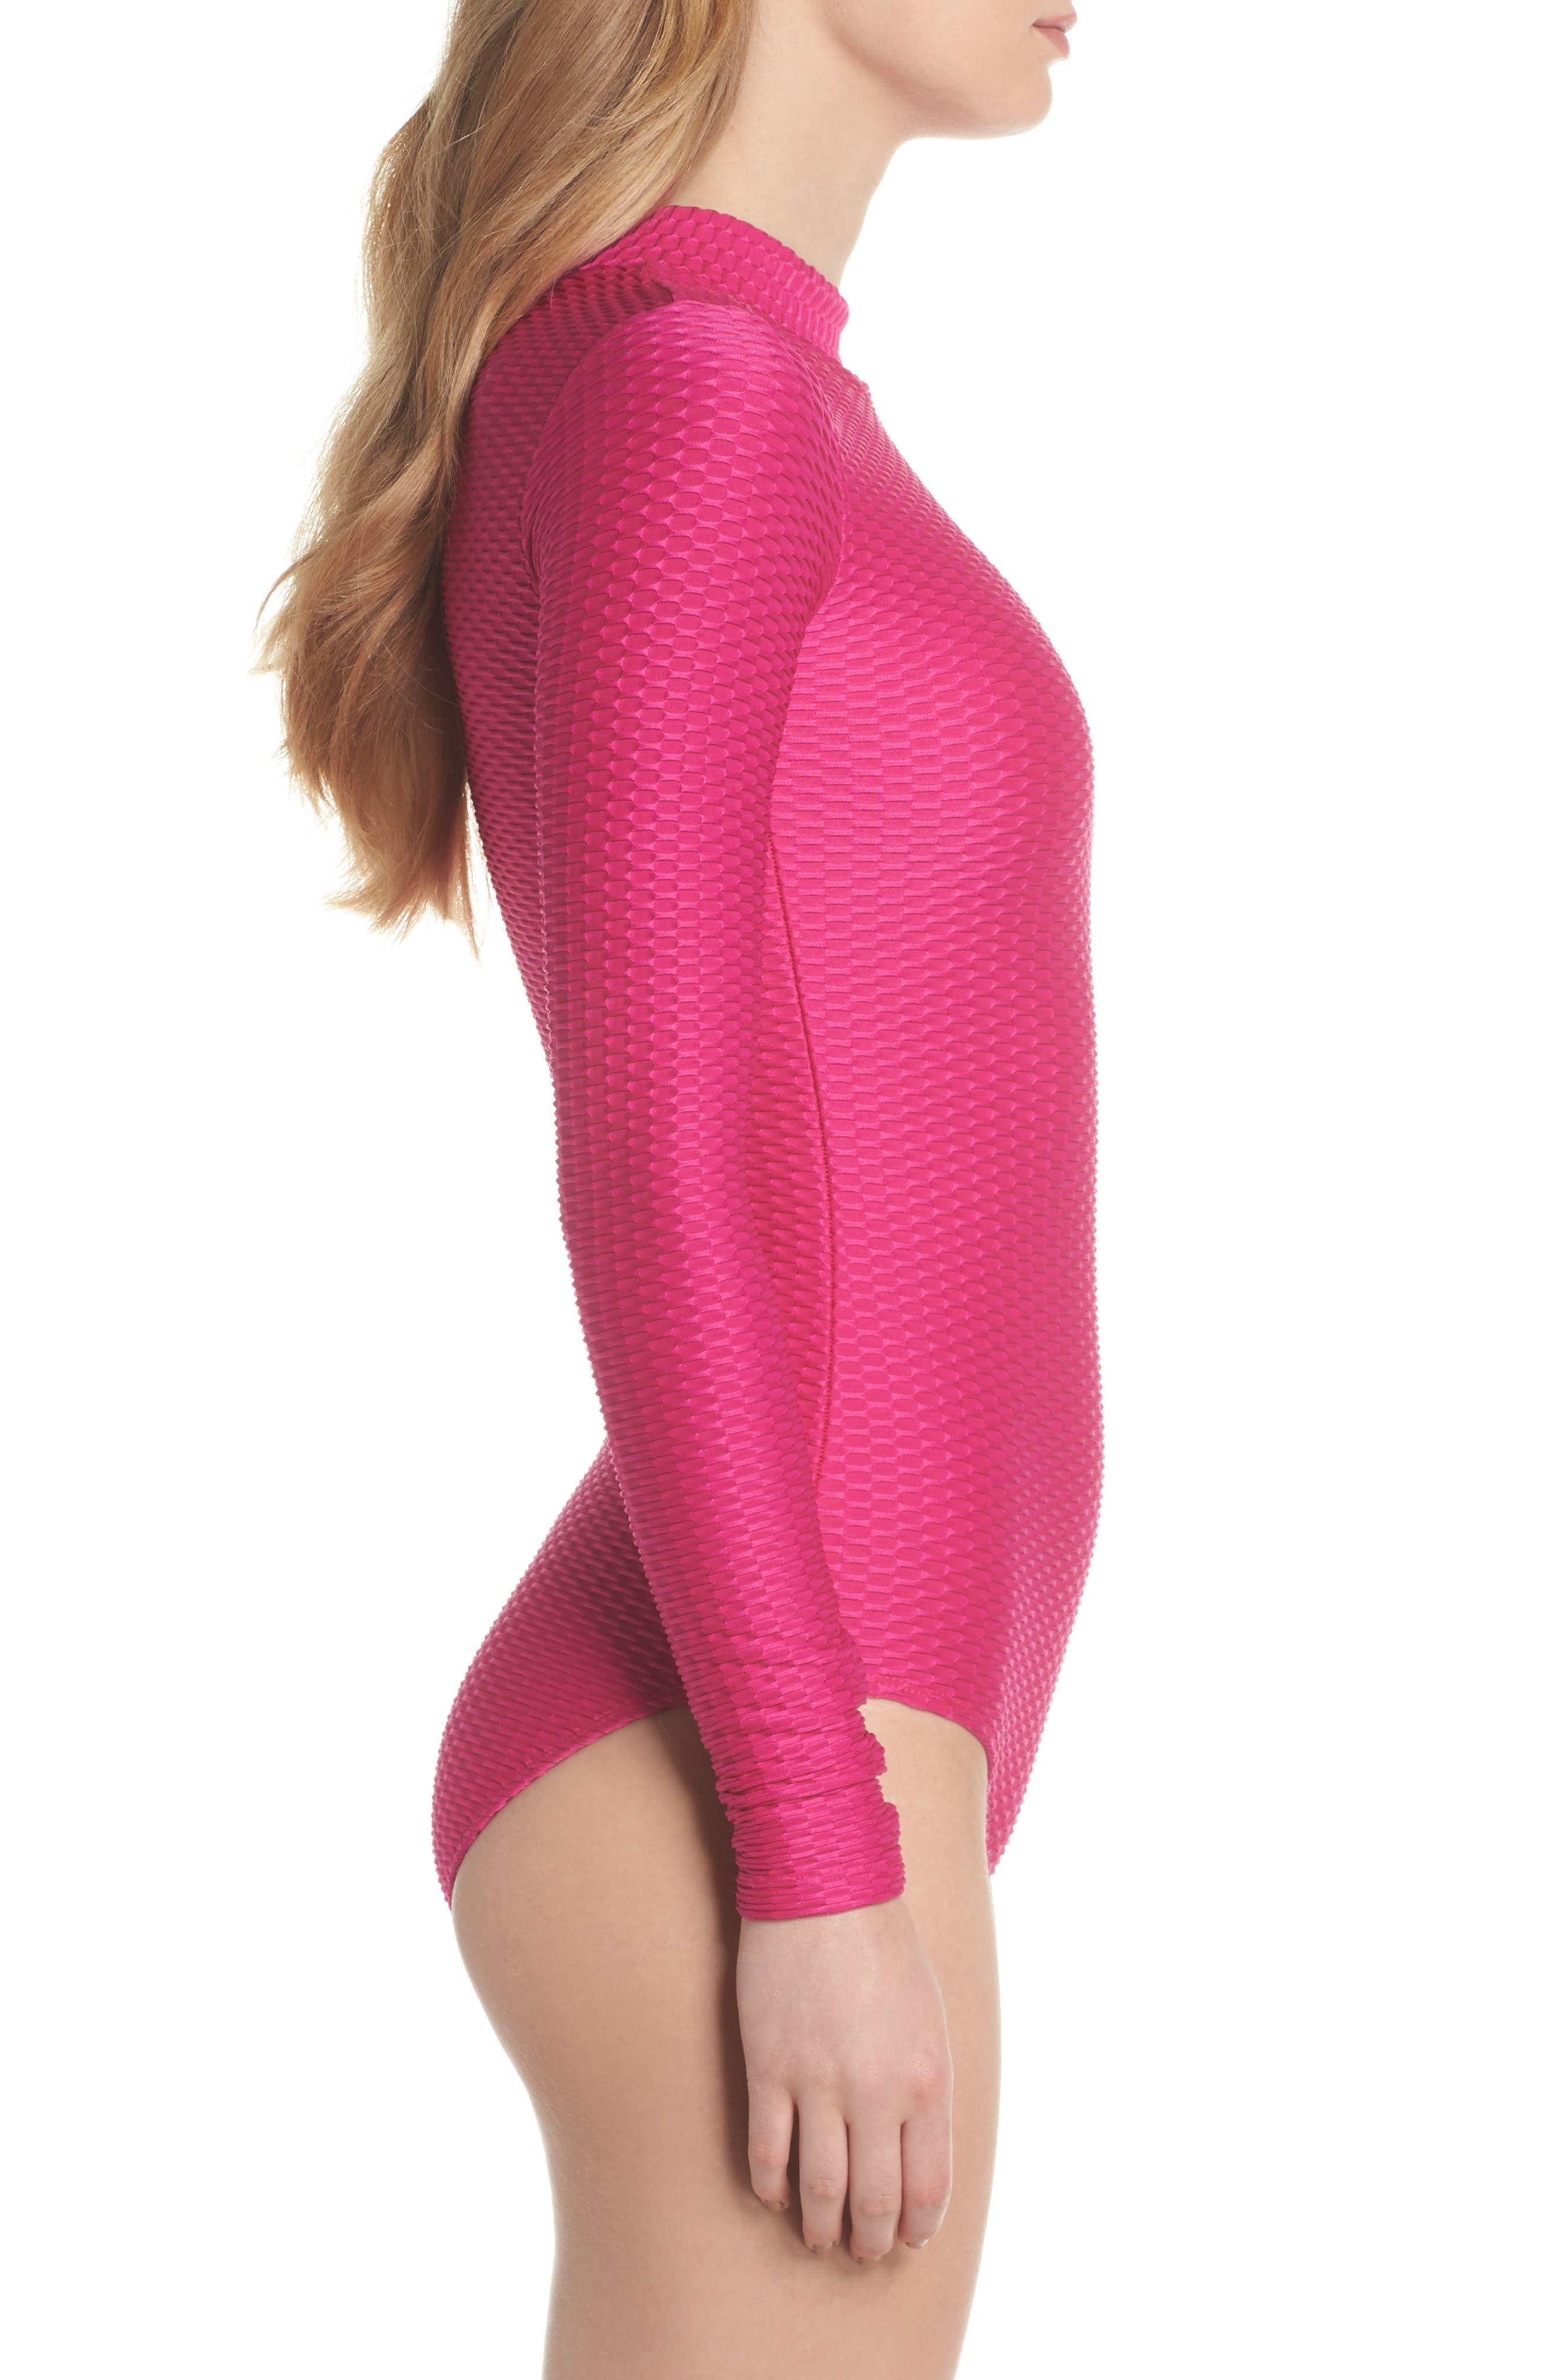 Long Sleeve One-Piece Swimsuit,                             Alternate thumbnail 3, color,                             Fuchsia